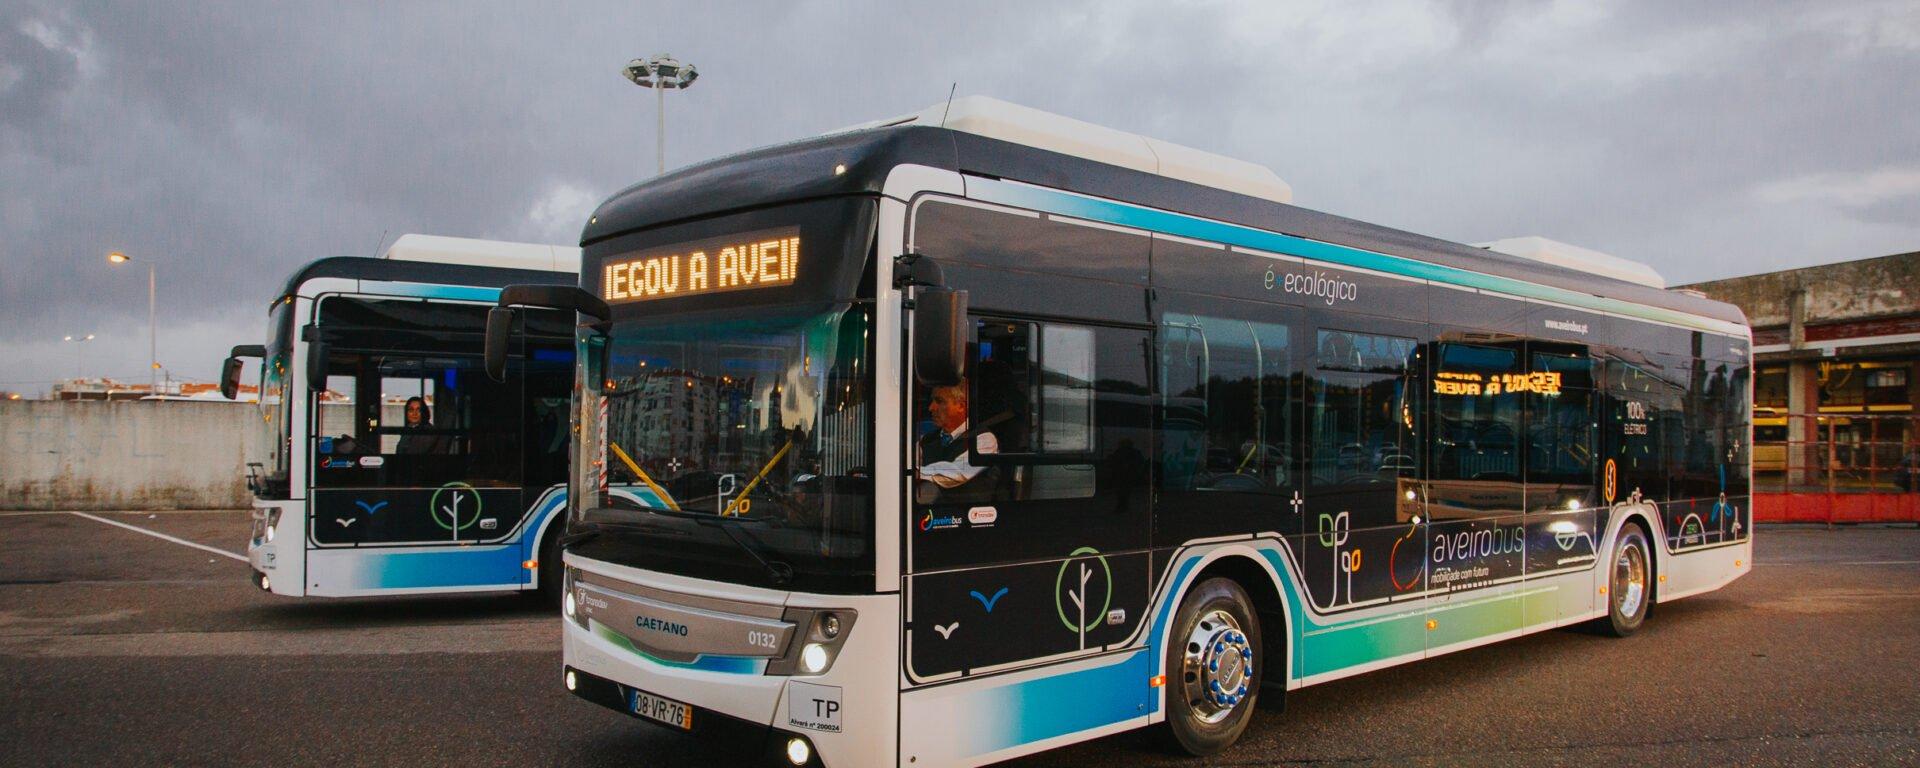 transdev-employees-in-aveiro-portugal-make-their-customers-very-satisfied-1